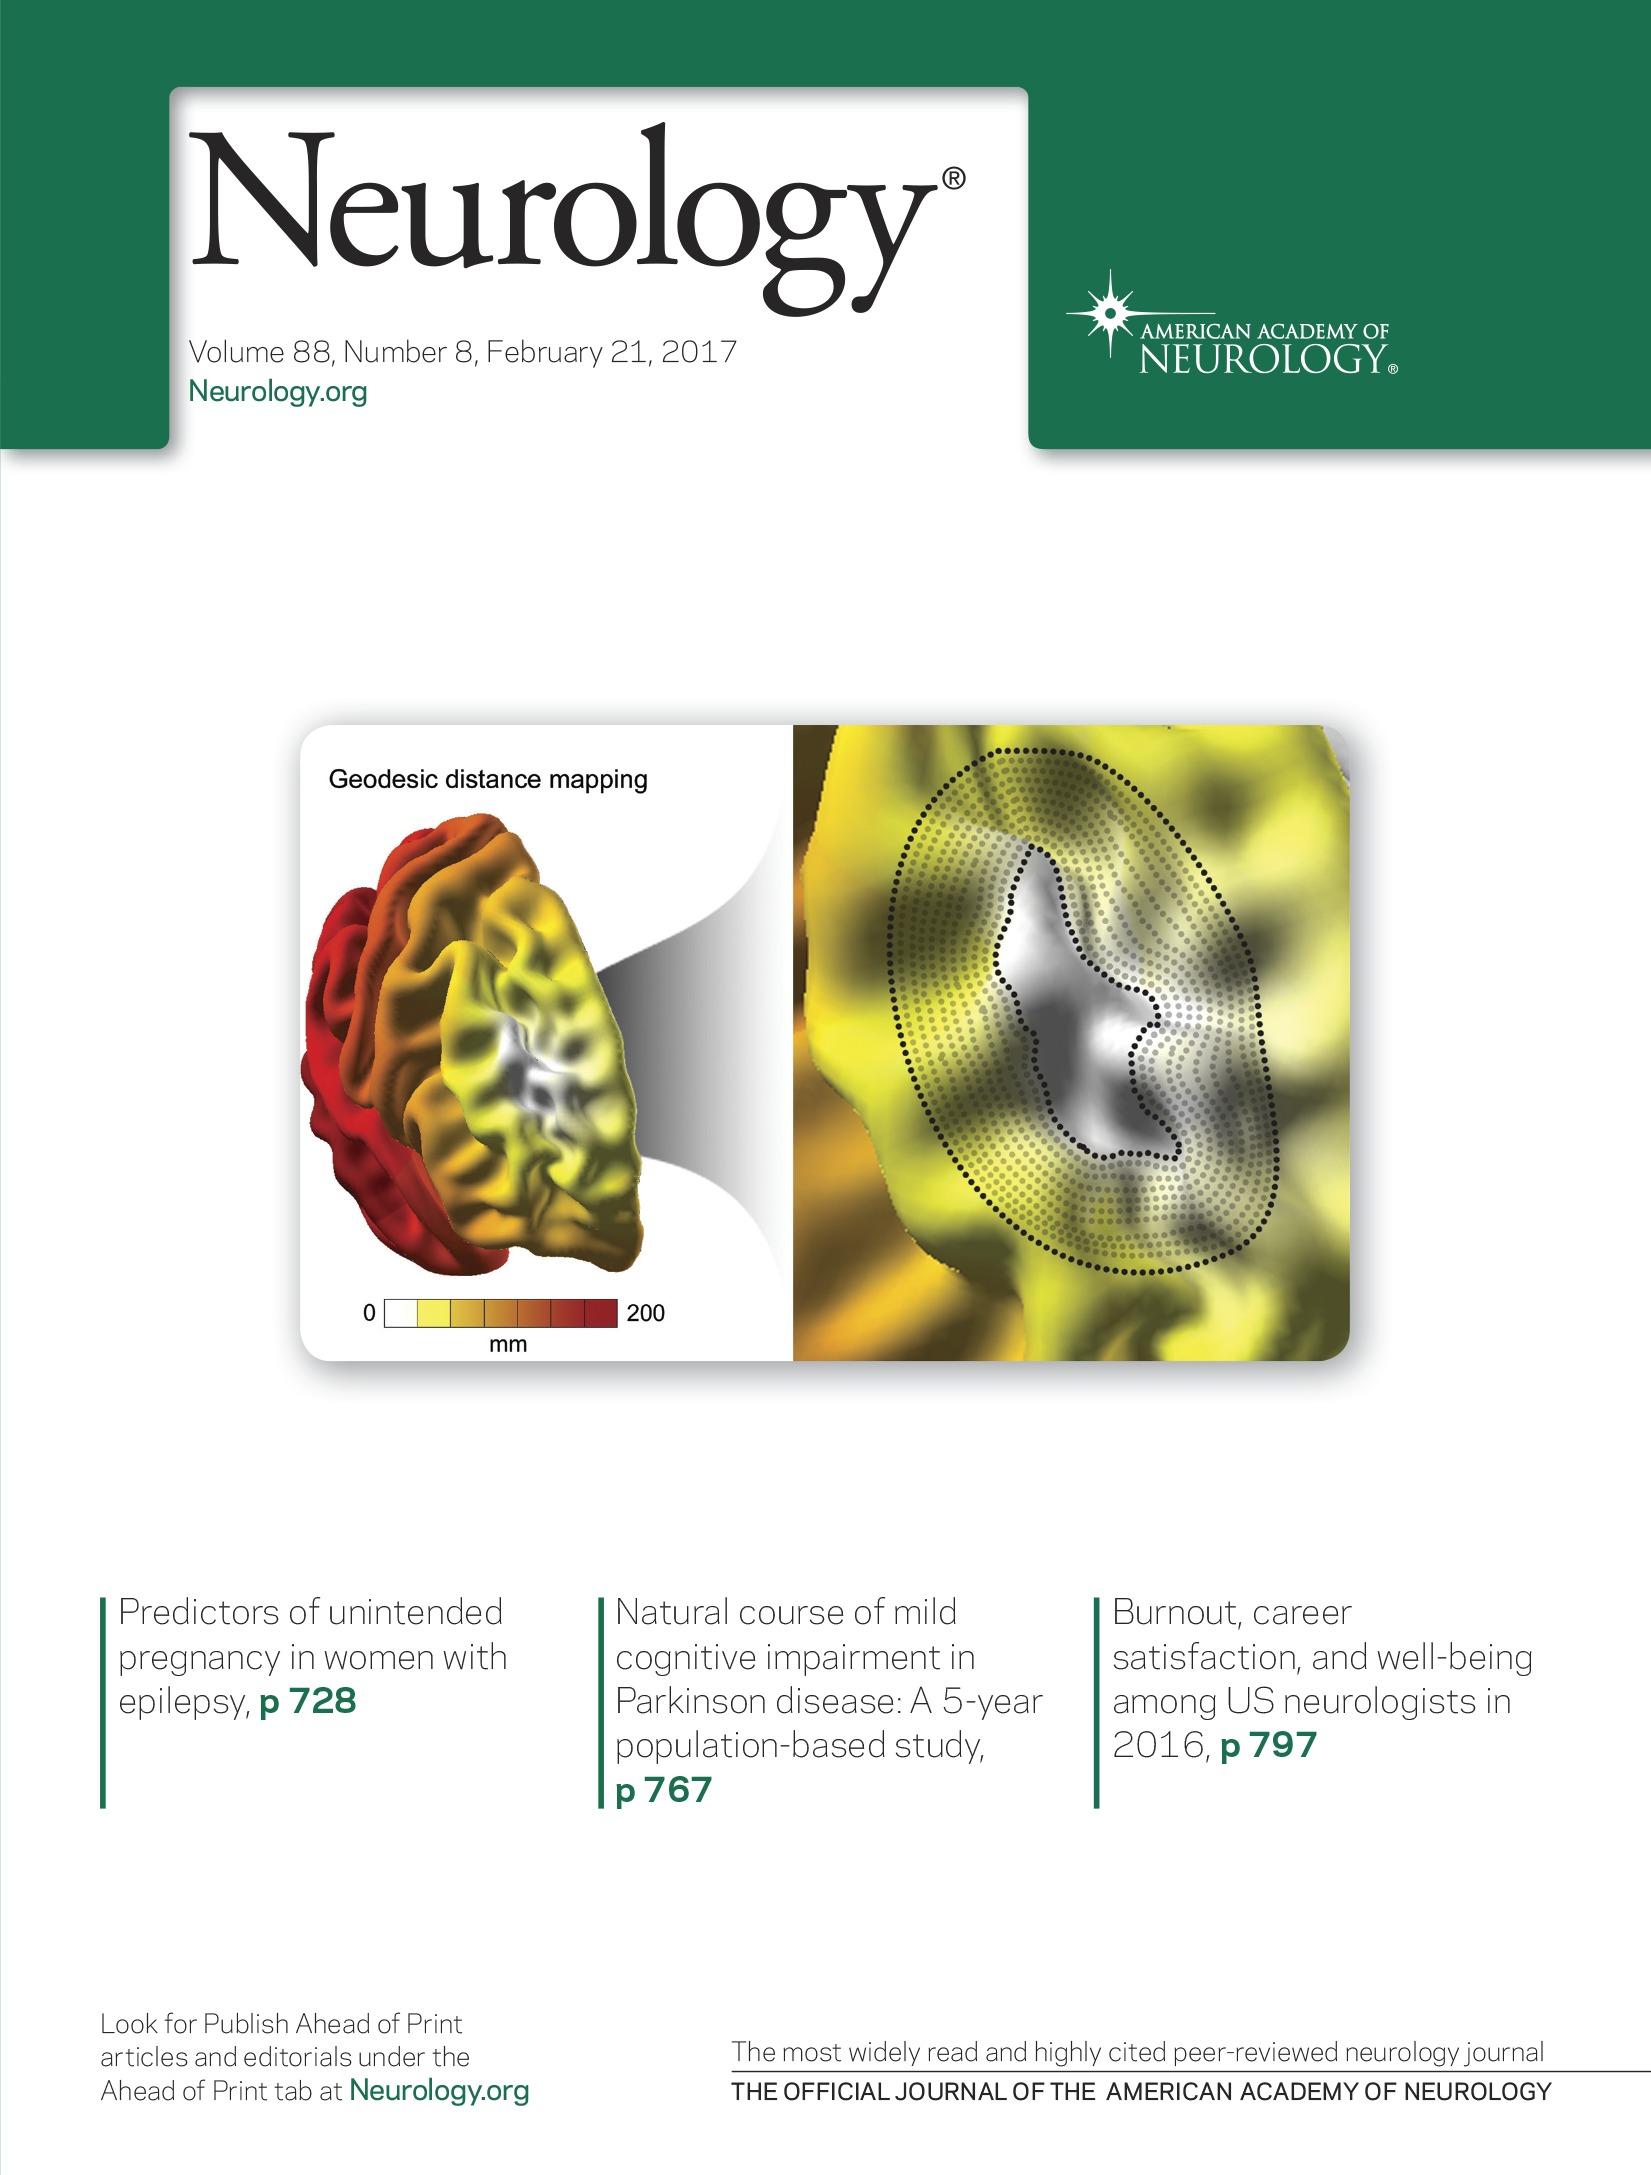 Natural course of mild cognitive impairment in Parkinson